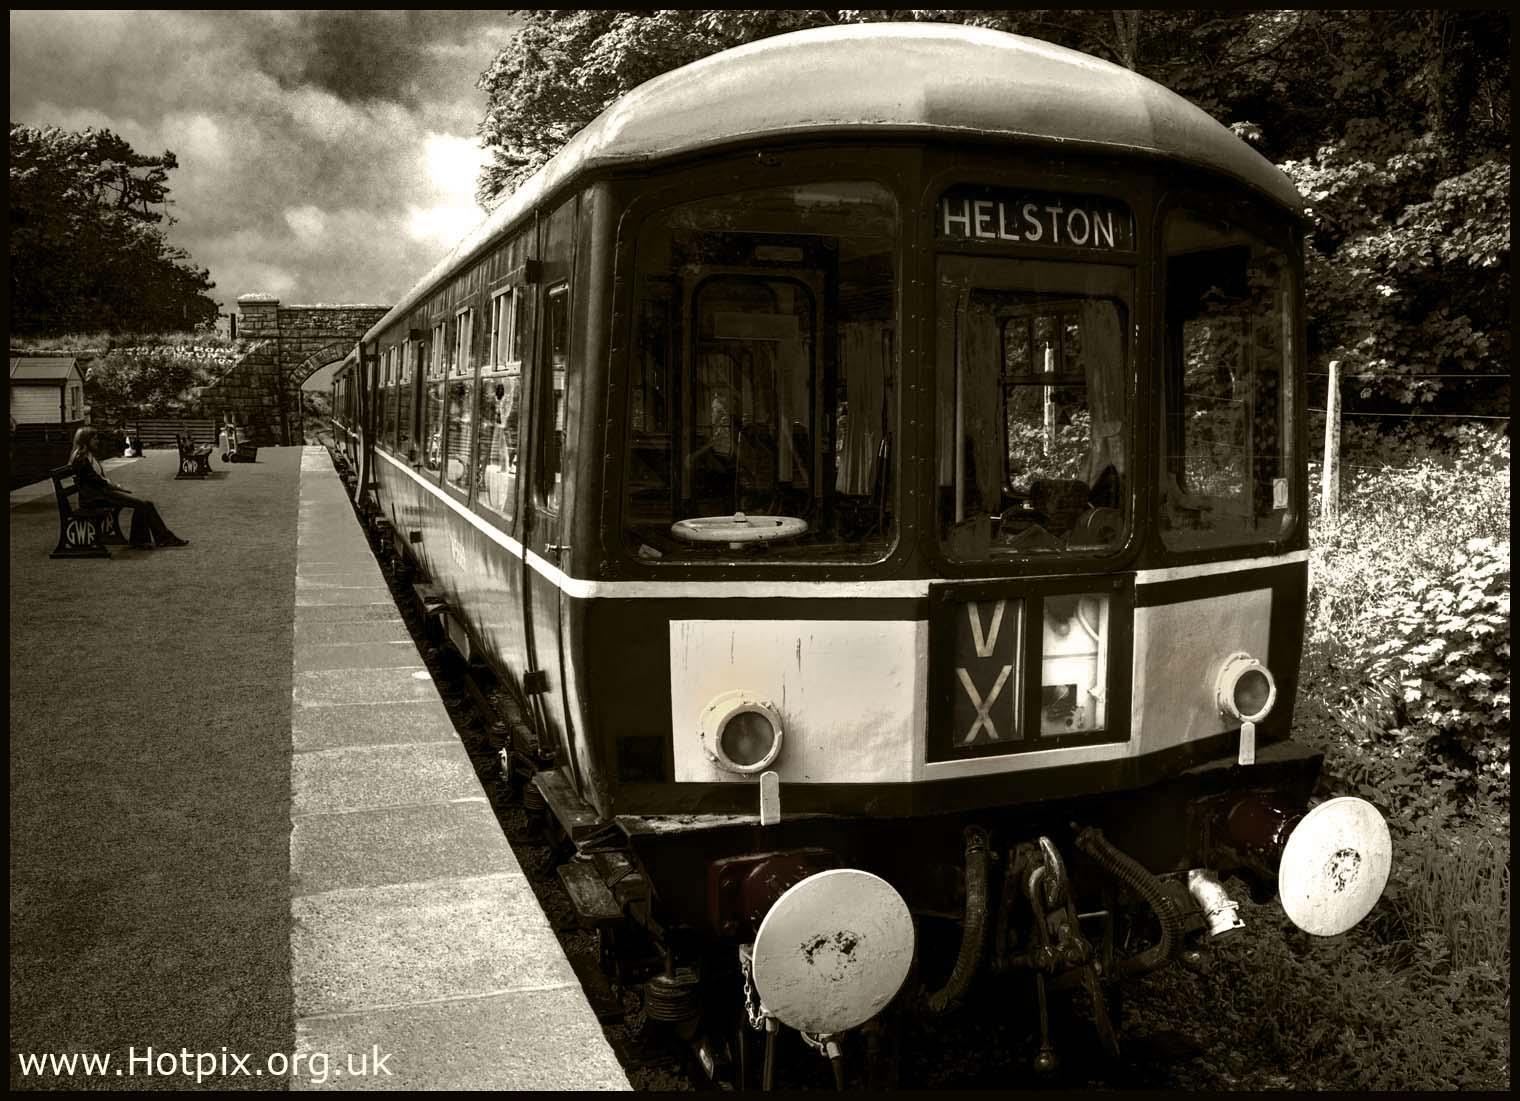 helston,rail,way,closed,Diesel,multiple,unit,old,rolling,stock,historic,railways,BR,british,great,western,railway,sepia,b/w,black,white,st.,ives,lizard,sout,west,england,britain,travarno,garden,gardens,treverno,trevarno,hotpix!,#tonysmith,#tonysmithhotpix,hotpix.rocketmail.com,hotpixuk.rocketmail.com,contact.tony.smith.gmail.com,tony.smith.gmail.com,tonys@miscs.com,tony.smith@mis-ams.com